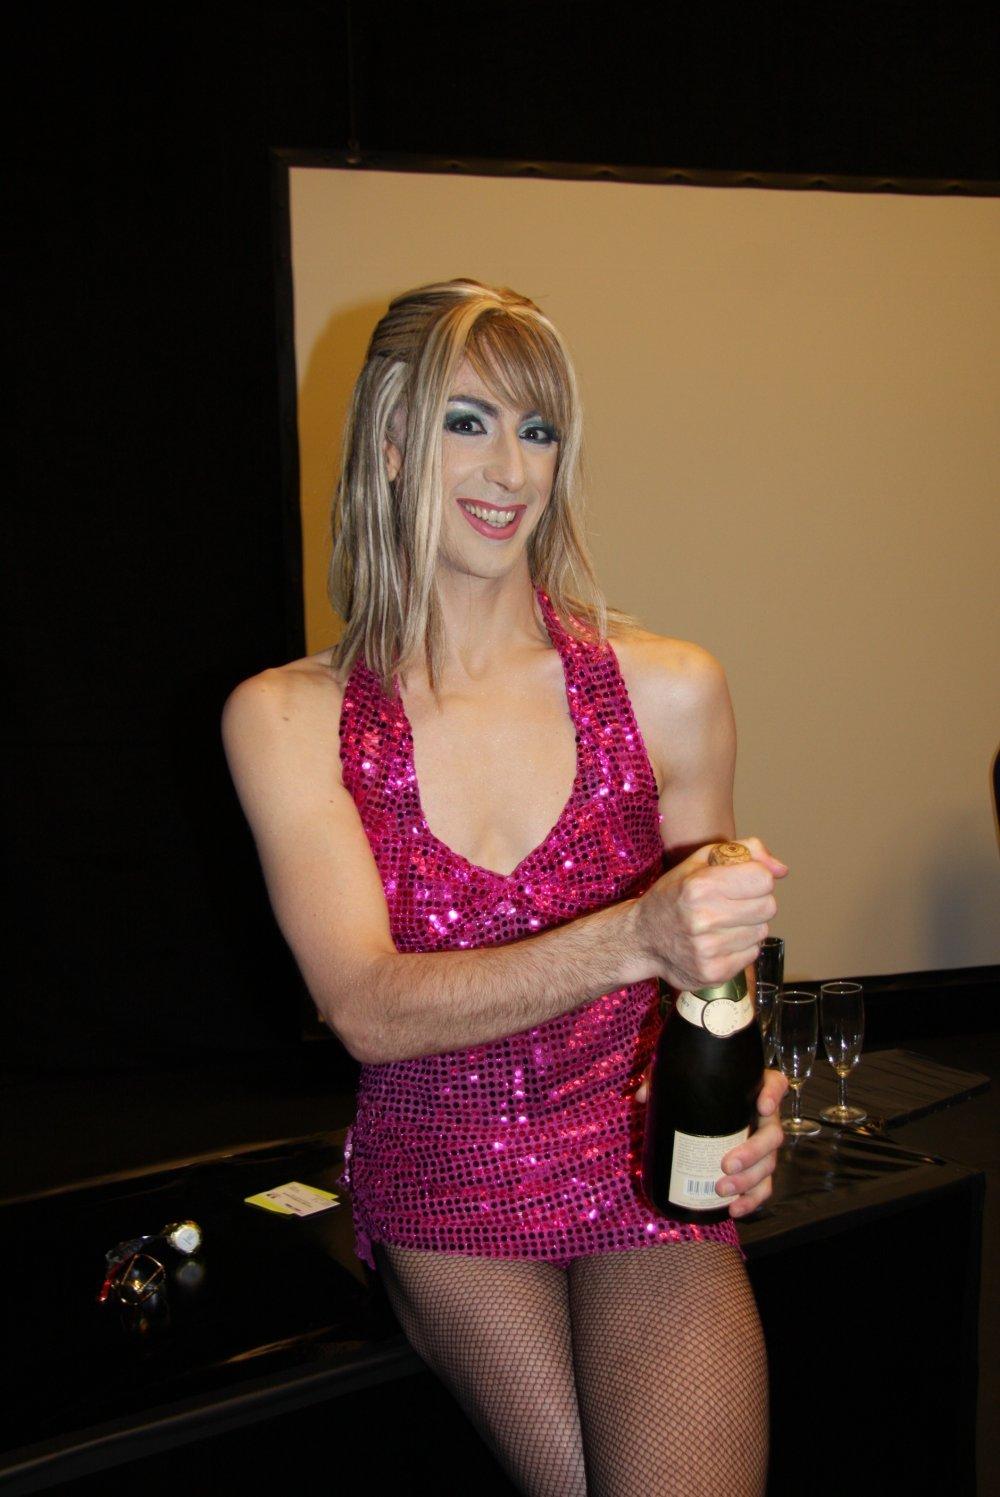 Zagreb oglasi transvestit Transvestit oglasi